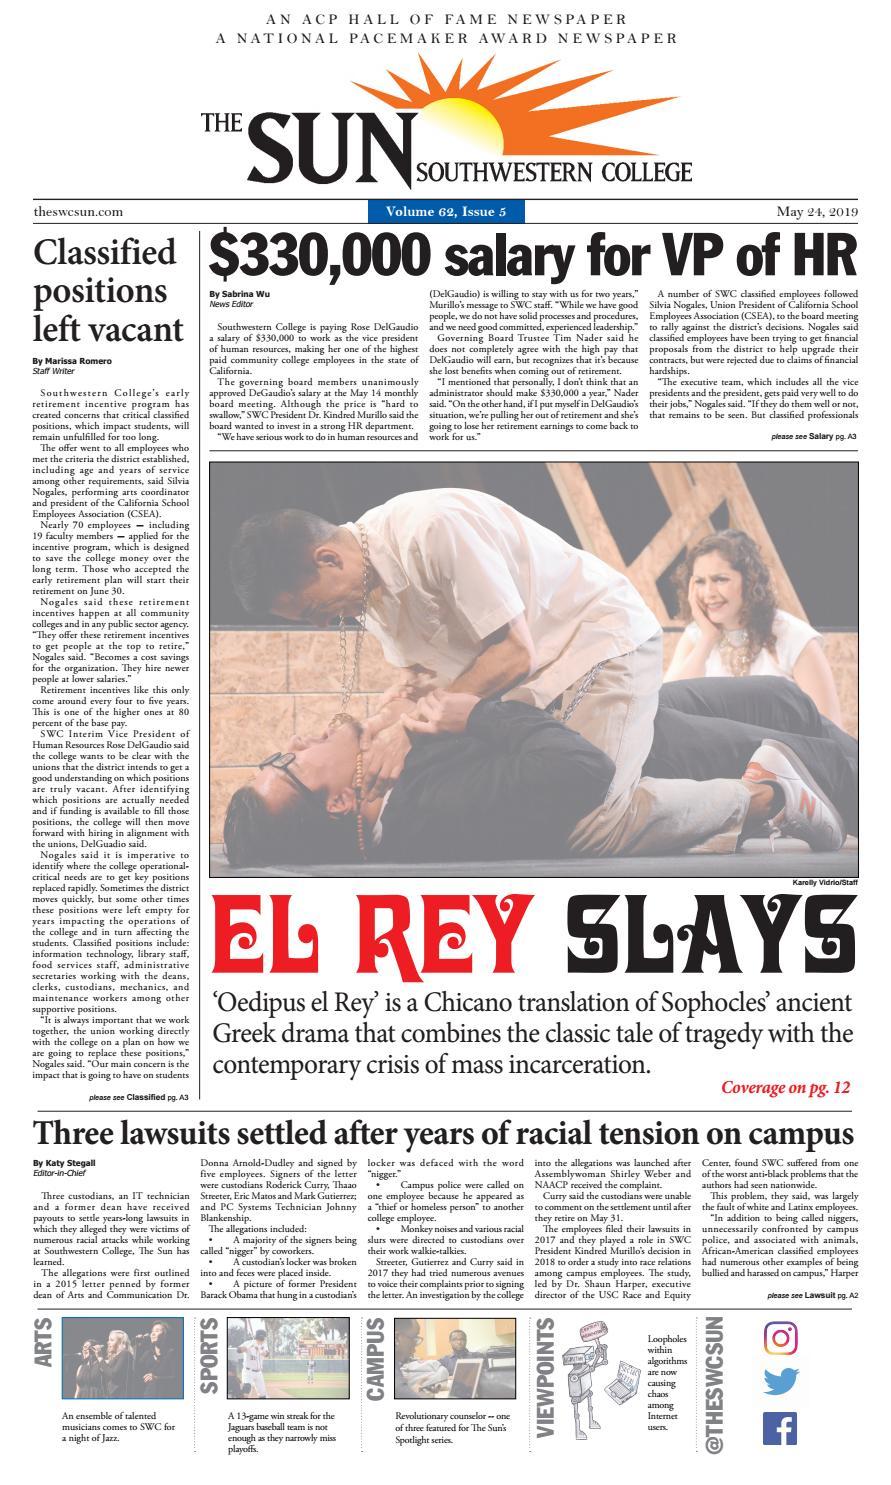 Vol 62 Issue 5 By Southwestern College Sun Newspaper Issuu